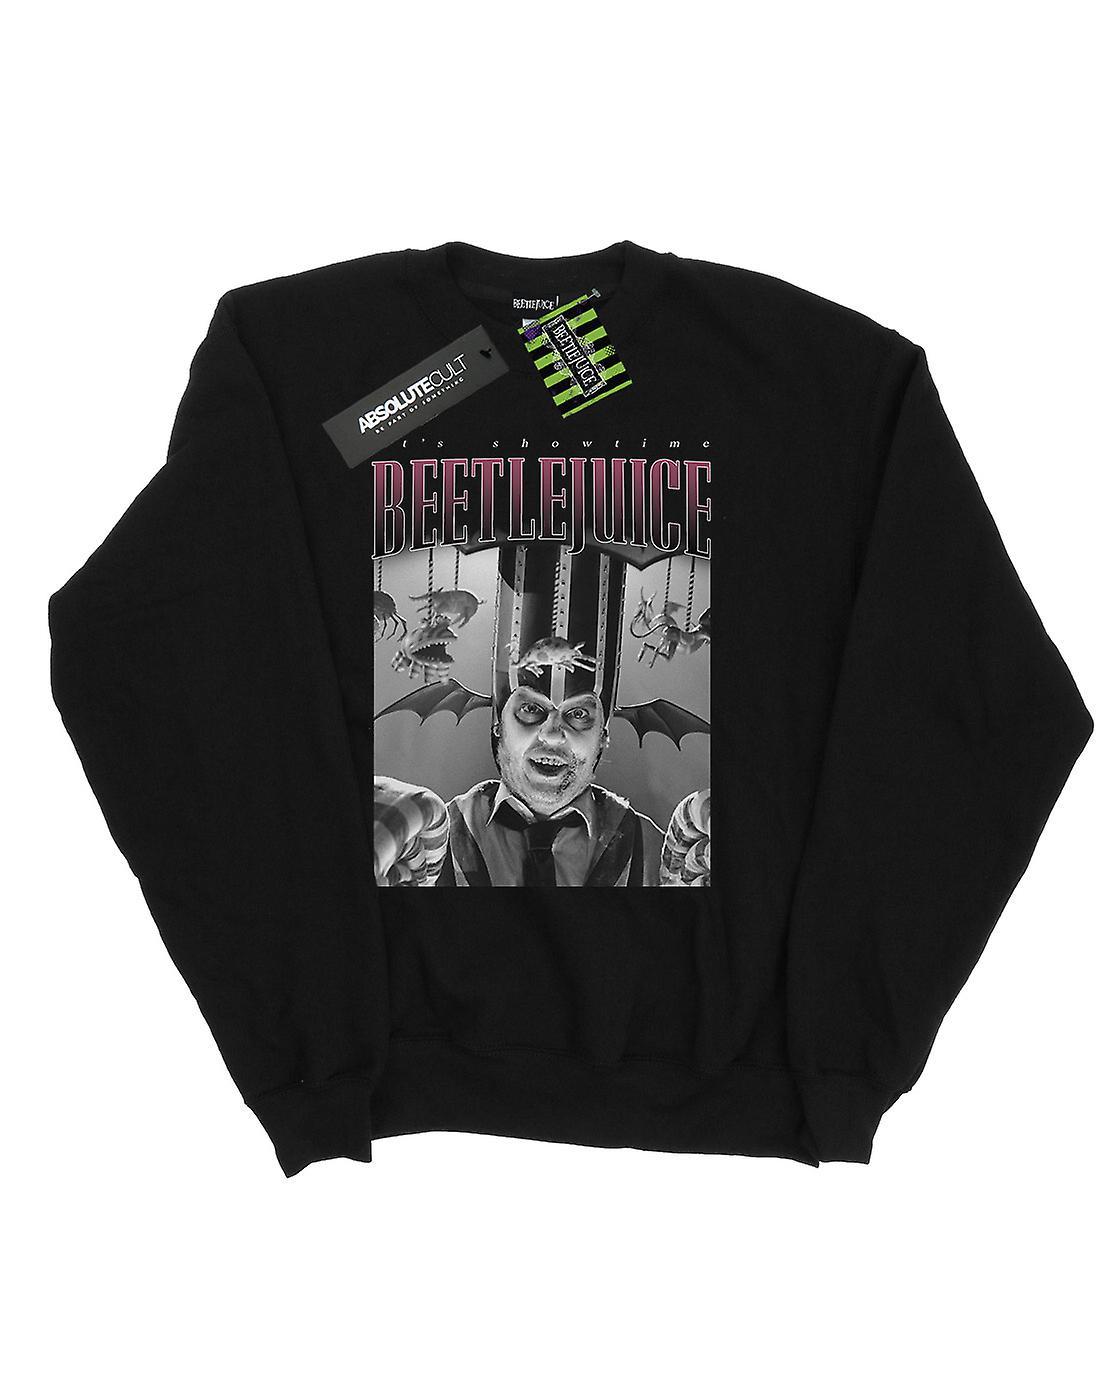 Beetlejuice Women's Circus Homage Sweatshirt